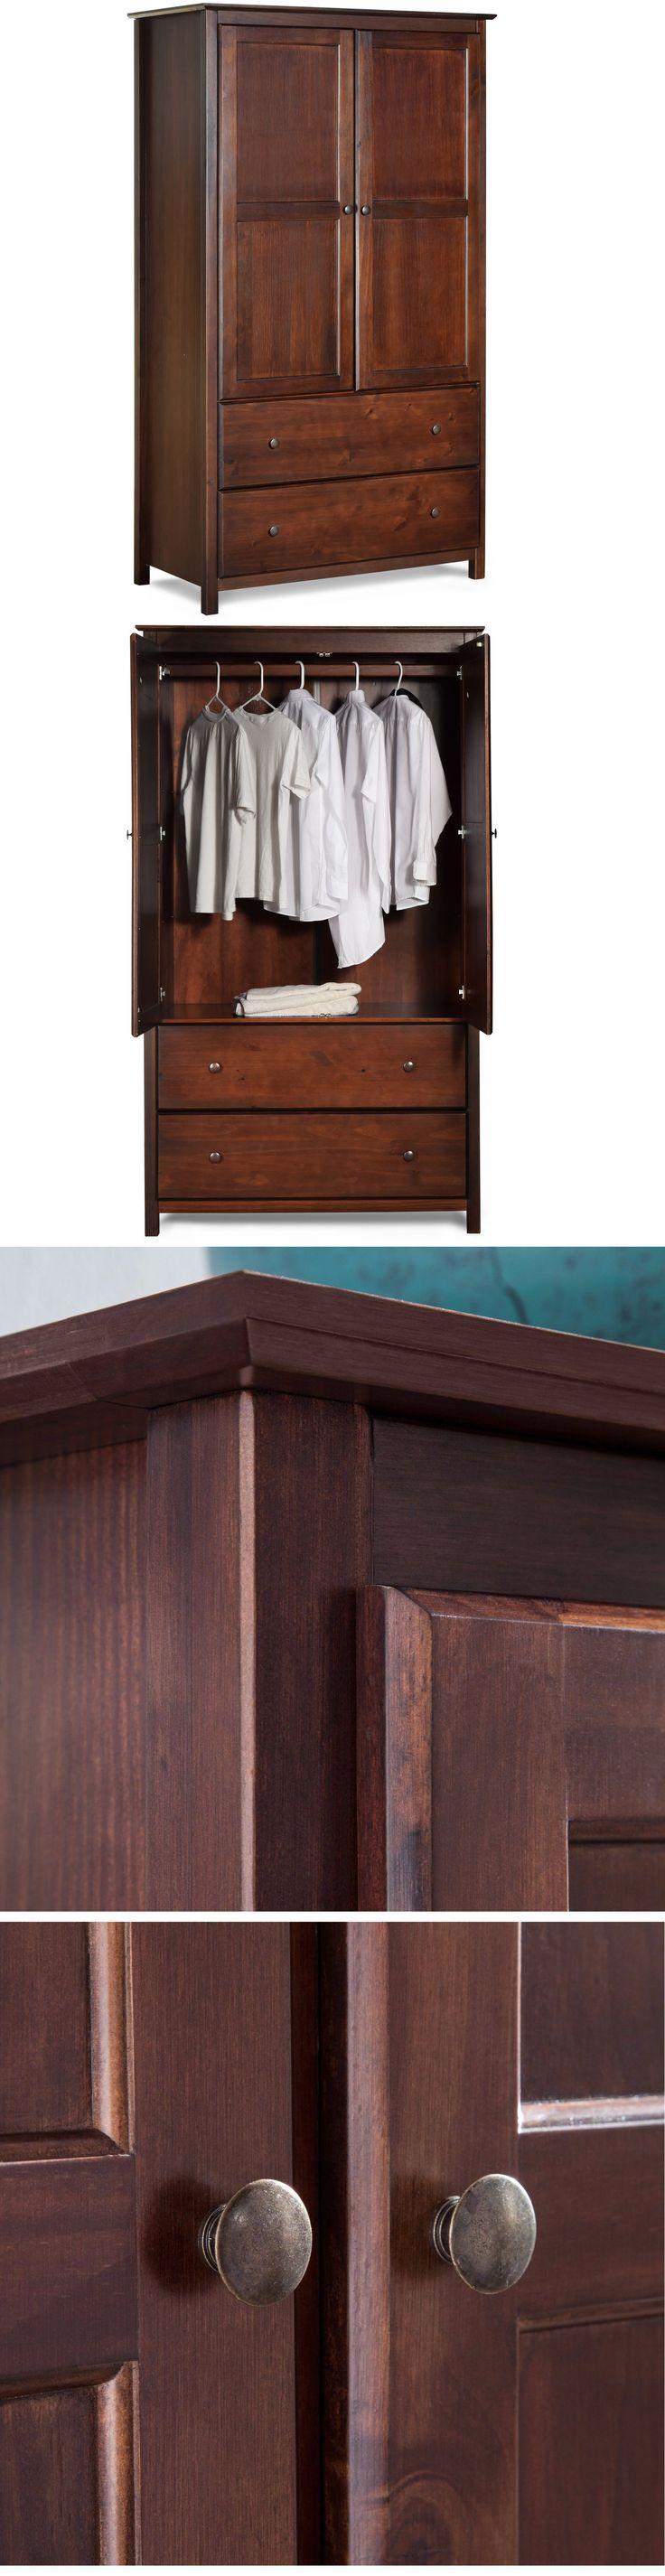 best 10+ discount bedroom furniture ideas on pinterest | buy